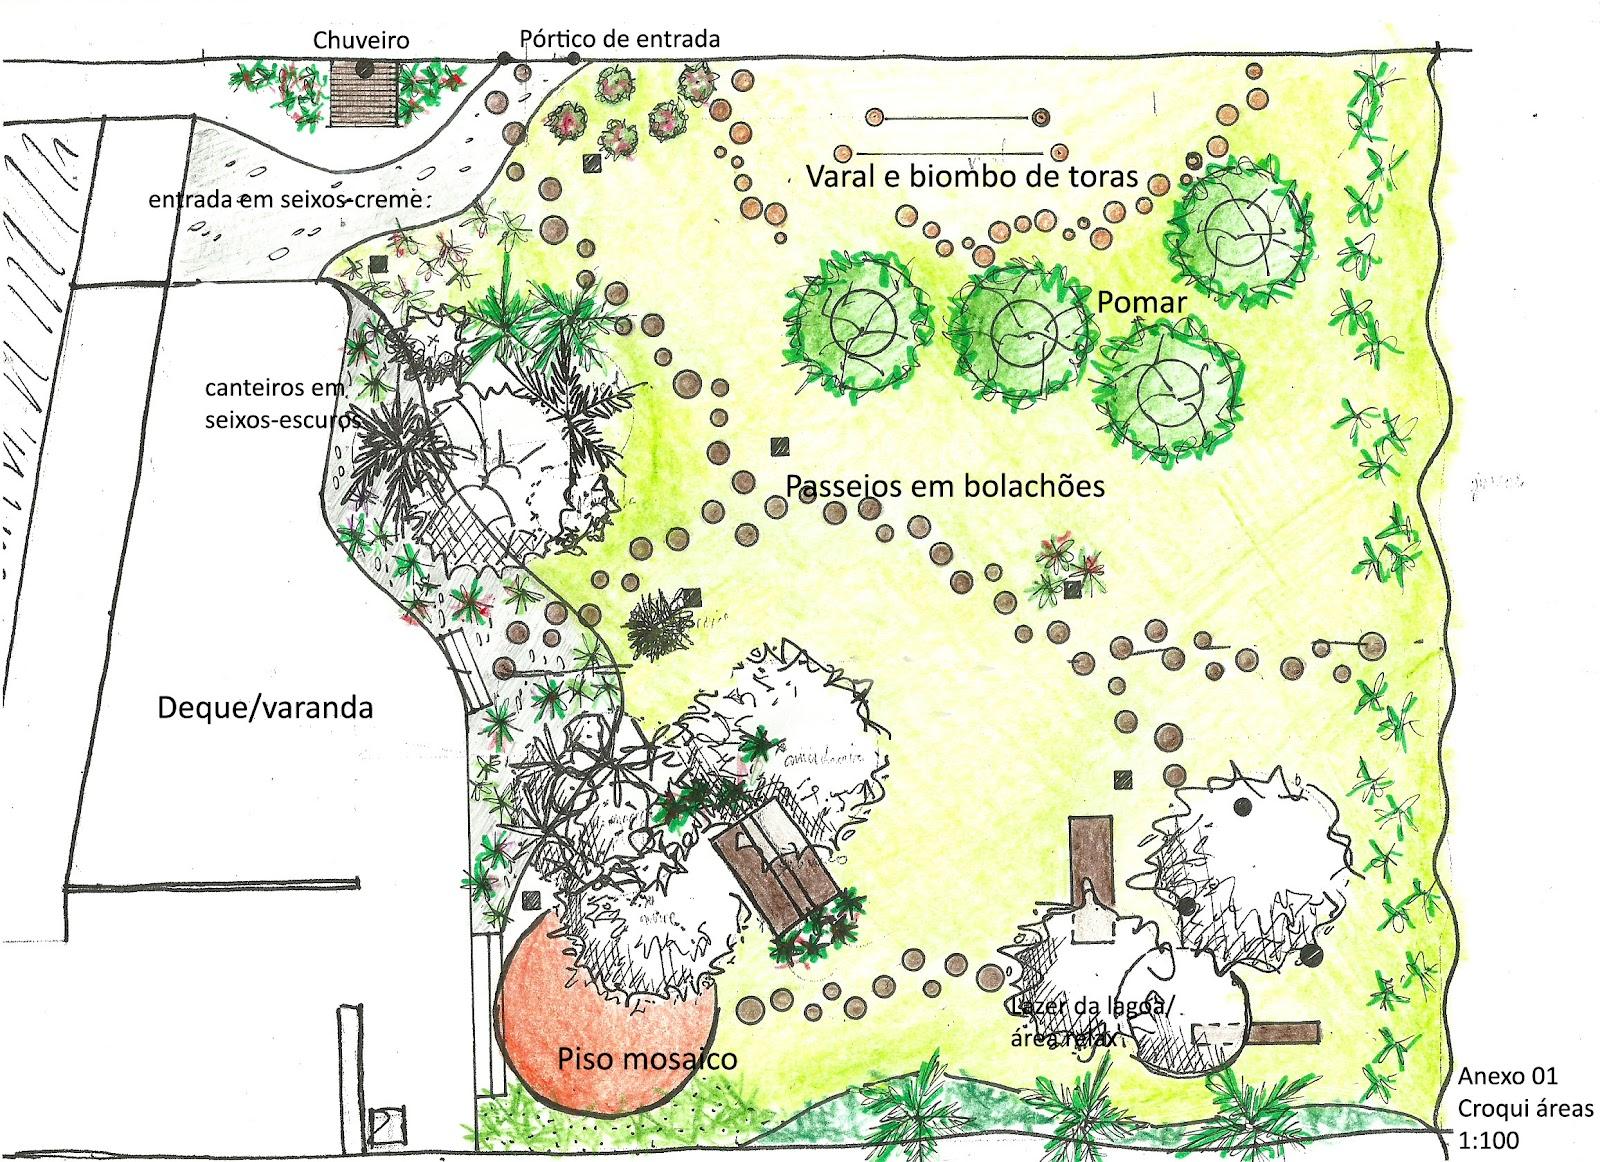 Terra Preta Paisagismo Projetos Manutencao De Jardins 2012